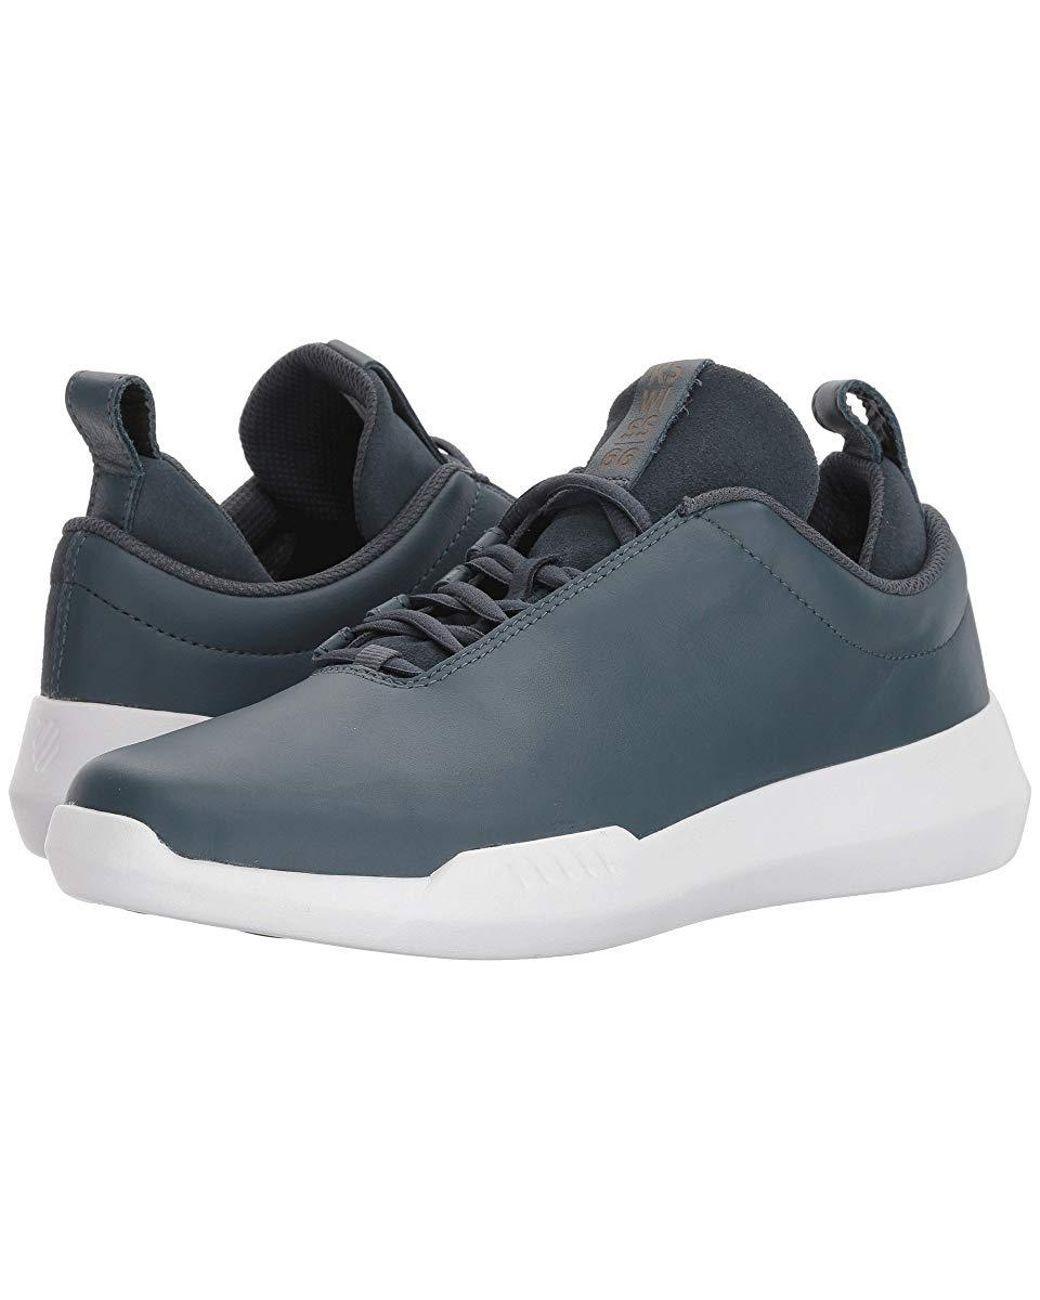 206c68cfc3a52 K-swiss Gen-k Icon (dark Slate/white) Tennis Shoes in Black for Men ...